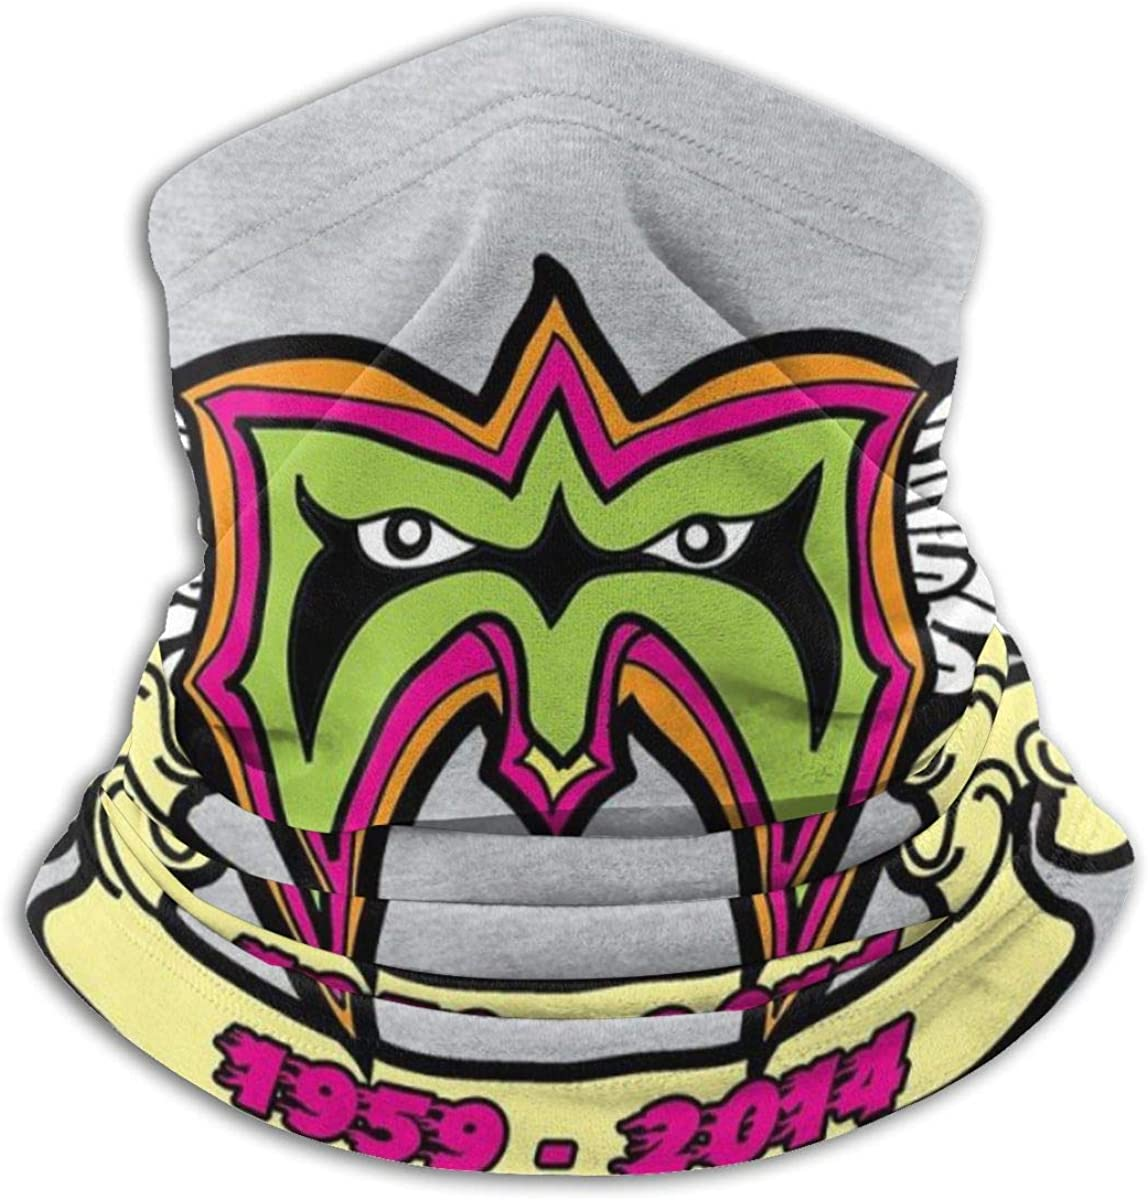 Amazon Com Ultimate Warrior Rip Logo Tribute Face Mask Bandanas For Dust Outdoors Festivals Sports Clothing